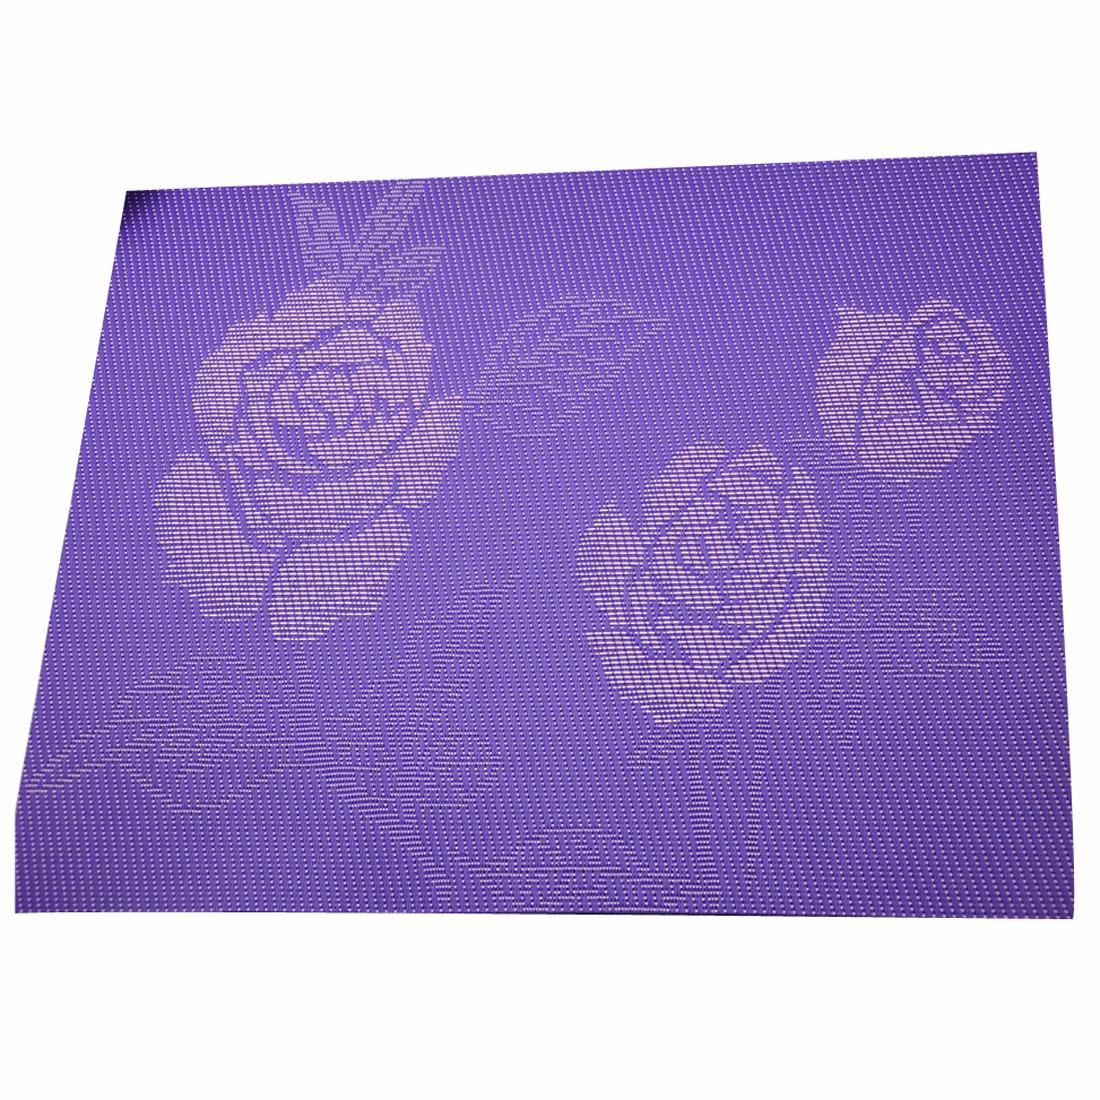 Kitchen Heat resistant Mats Placemats Rose Pattern Pad  : 4015C0079 from ebay.co.uk size 1100 x 1100 jpeg 446kB